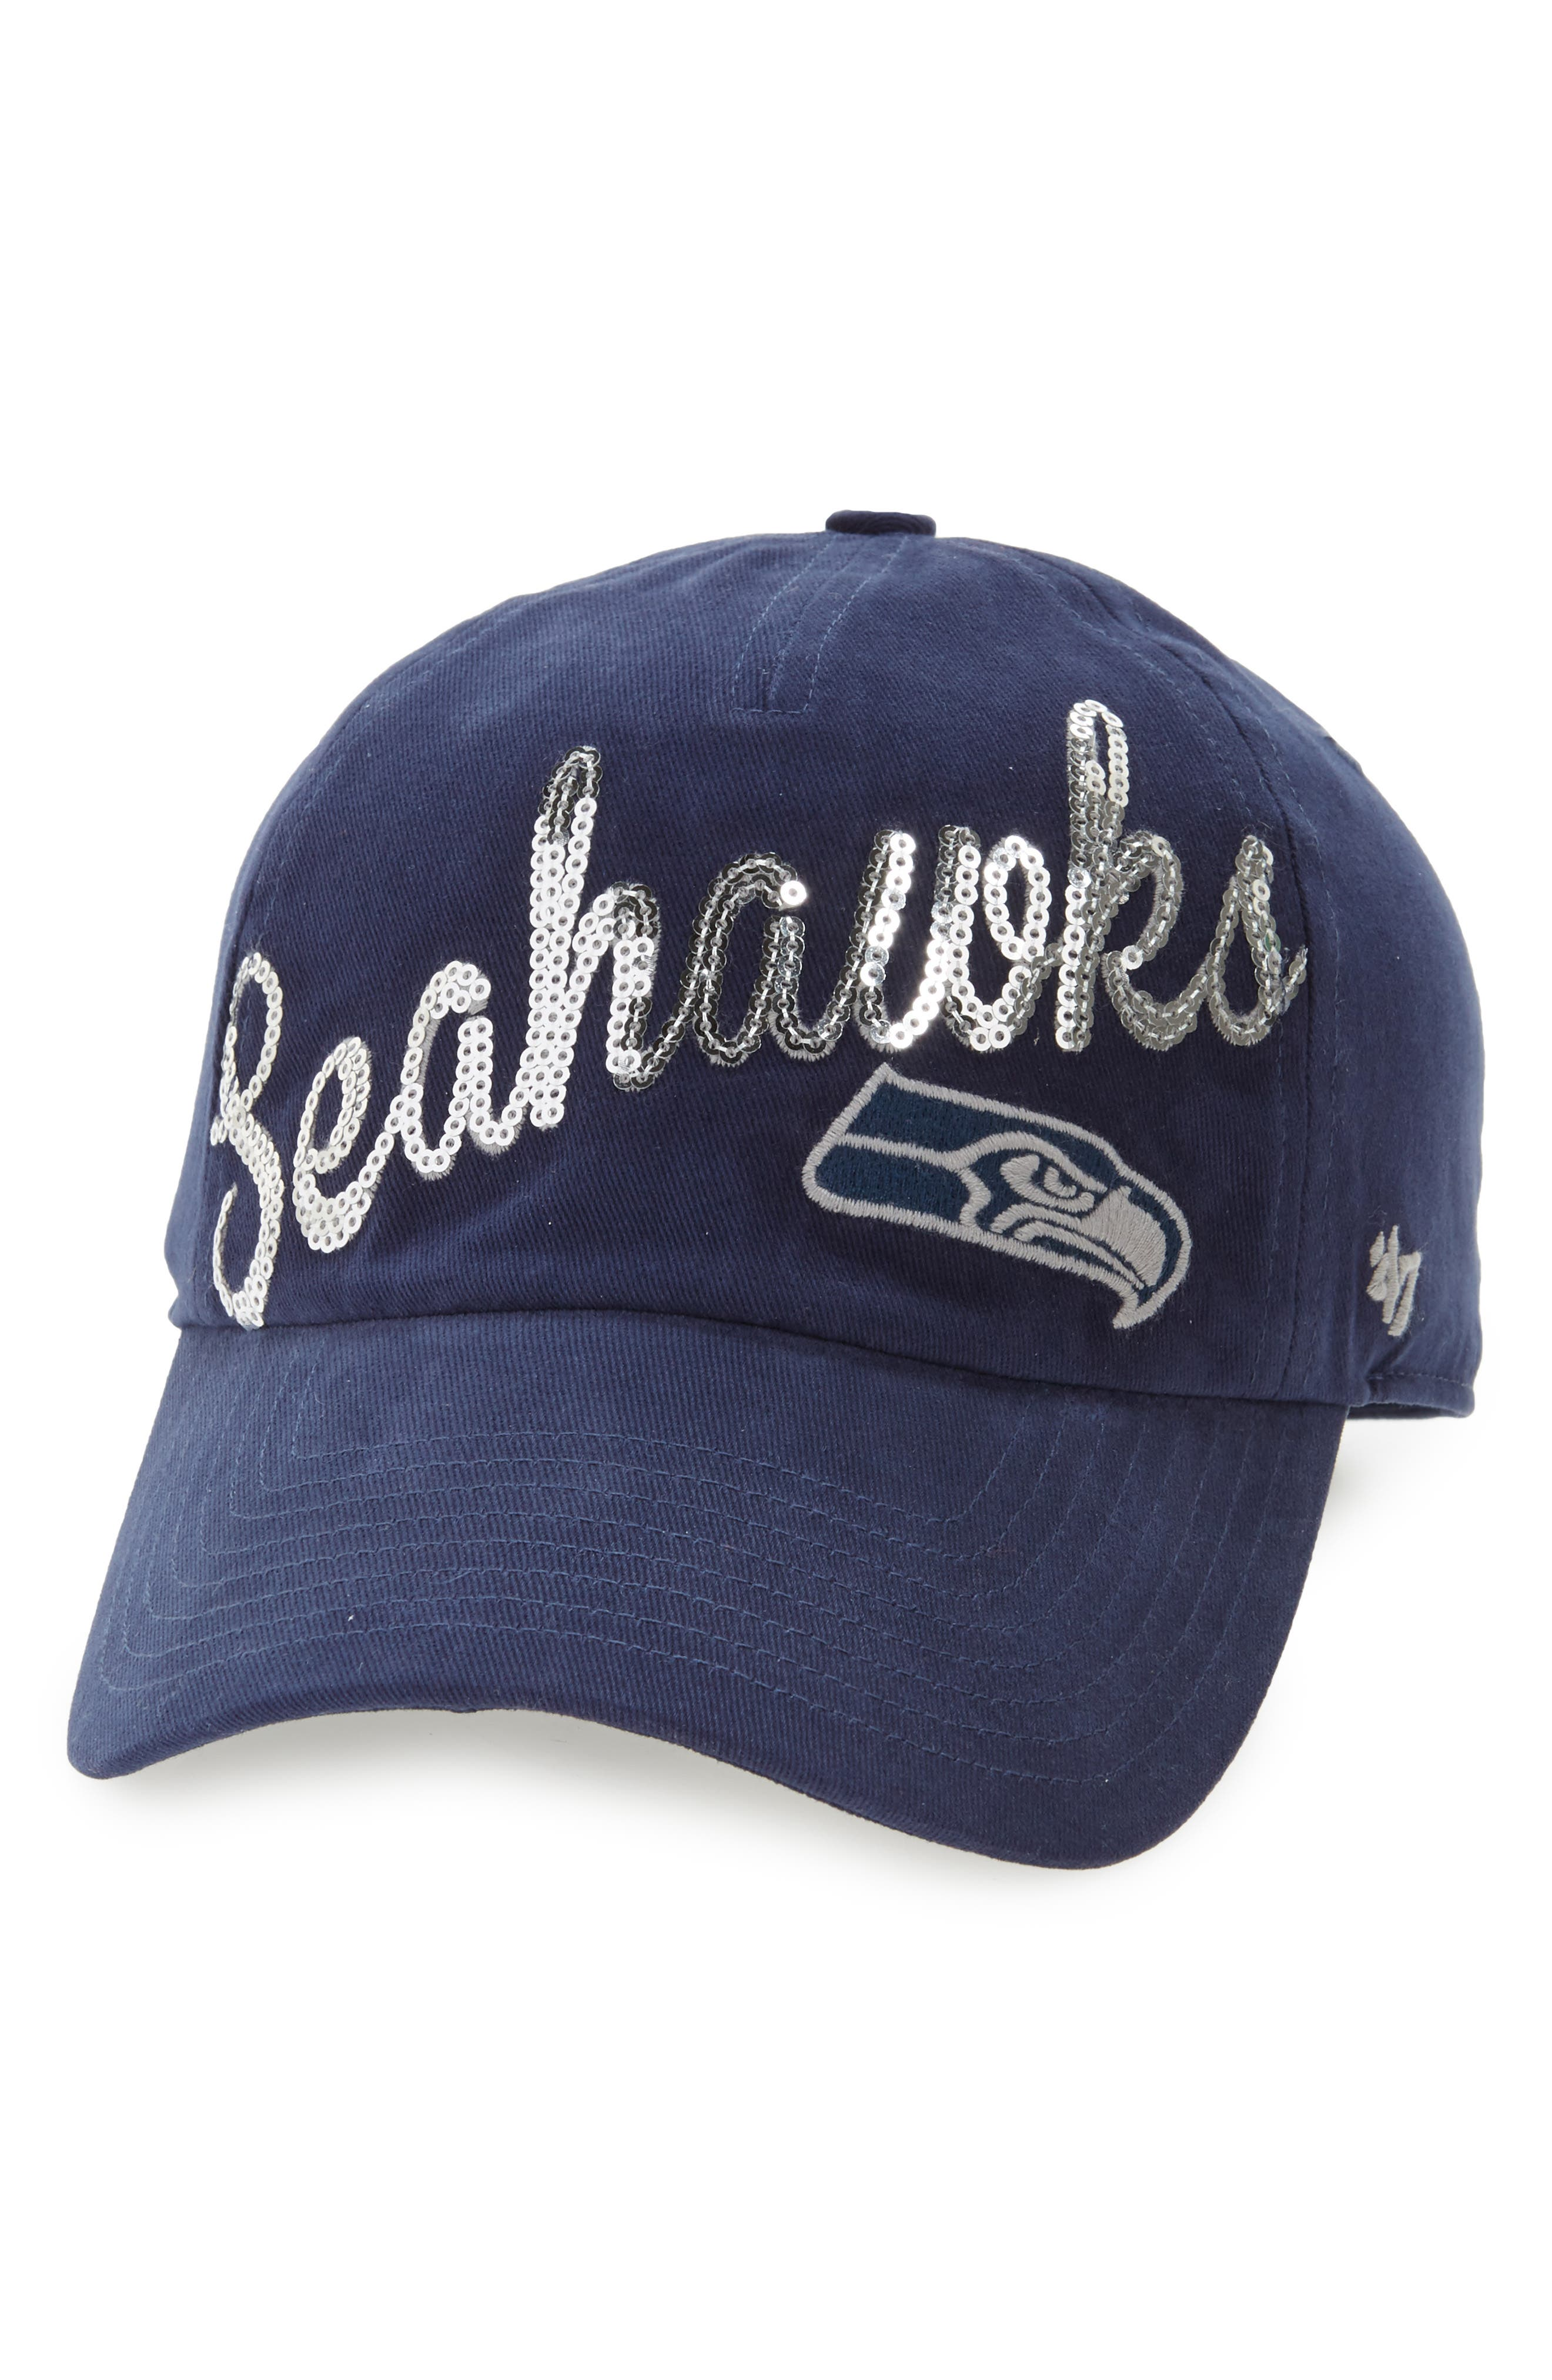 47 Seattle Seahawks Sparkle Cap